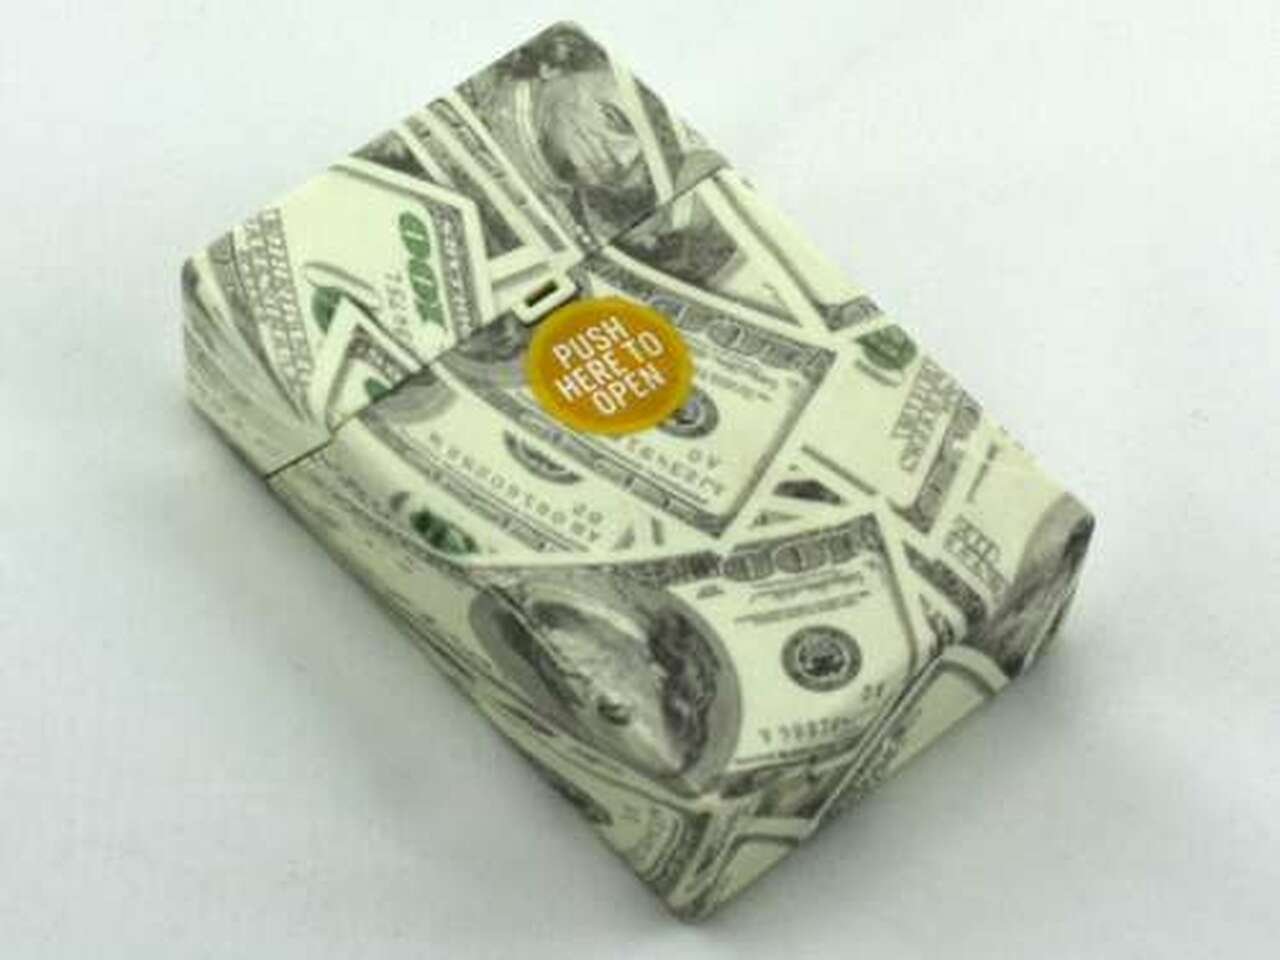 $100 Design Cigarette Pack Holder